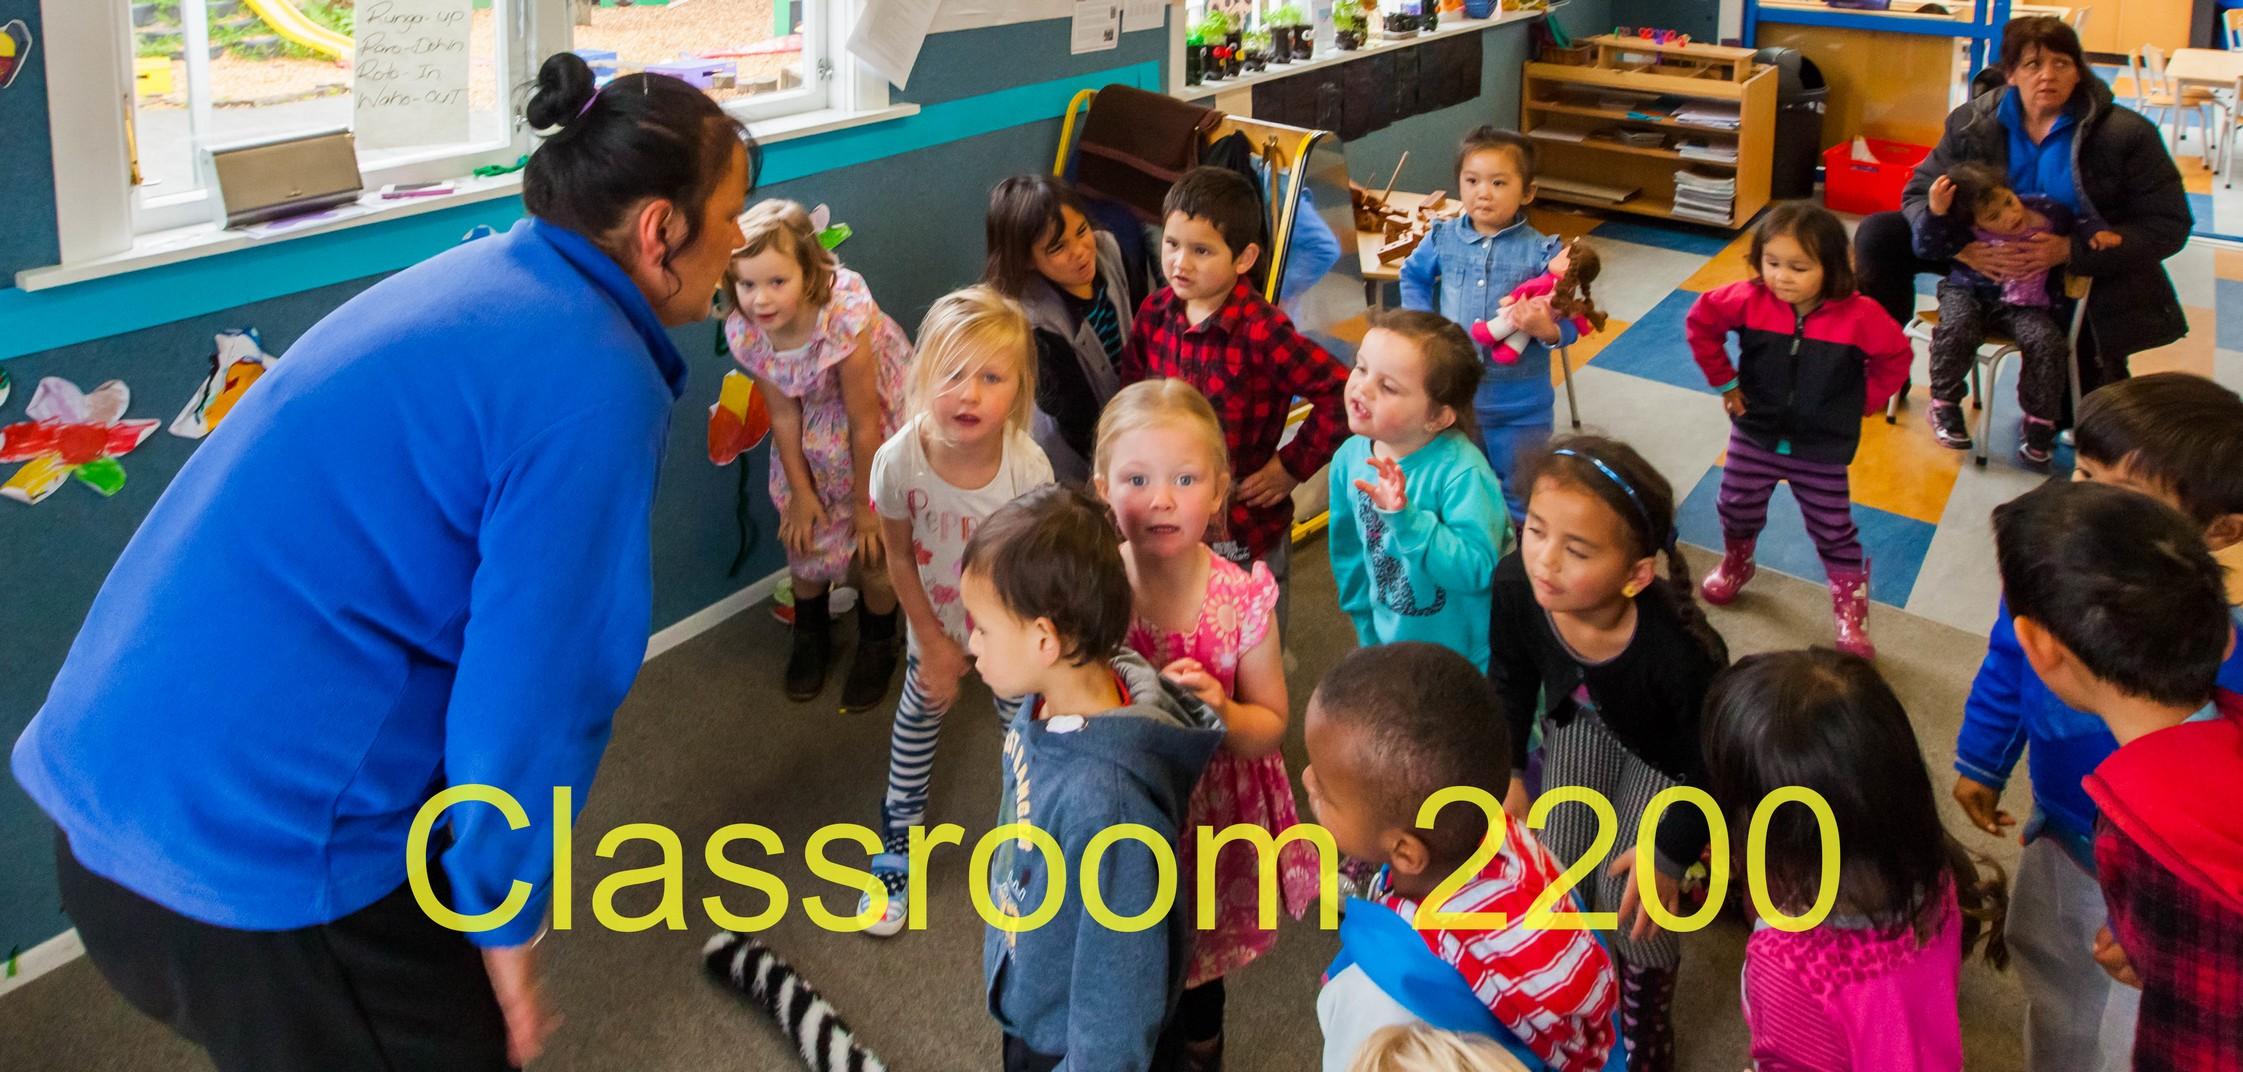 Classroom 2200